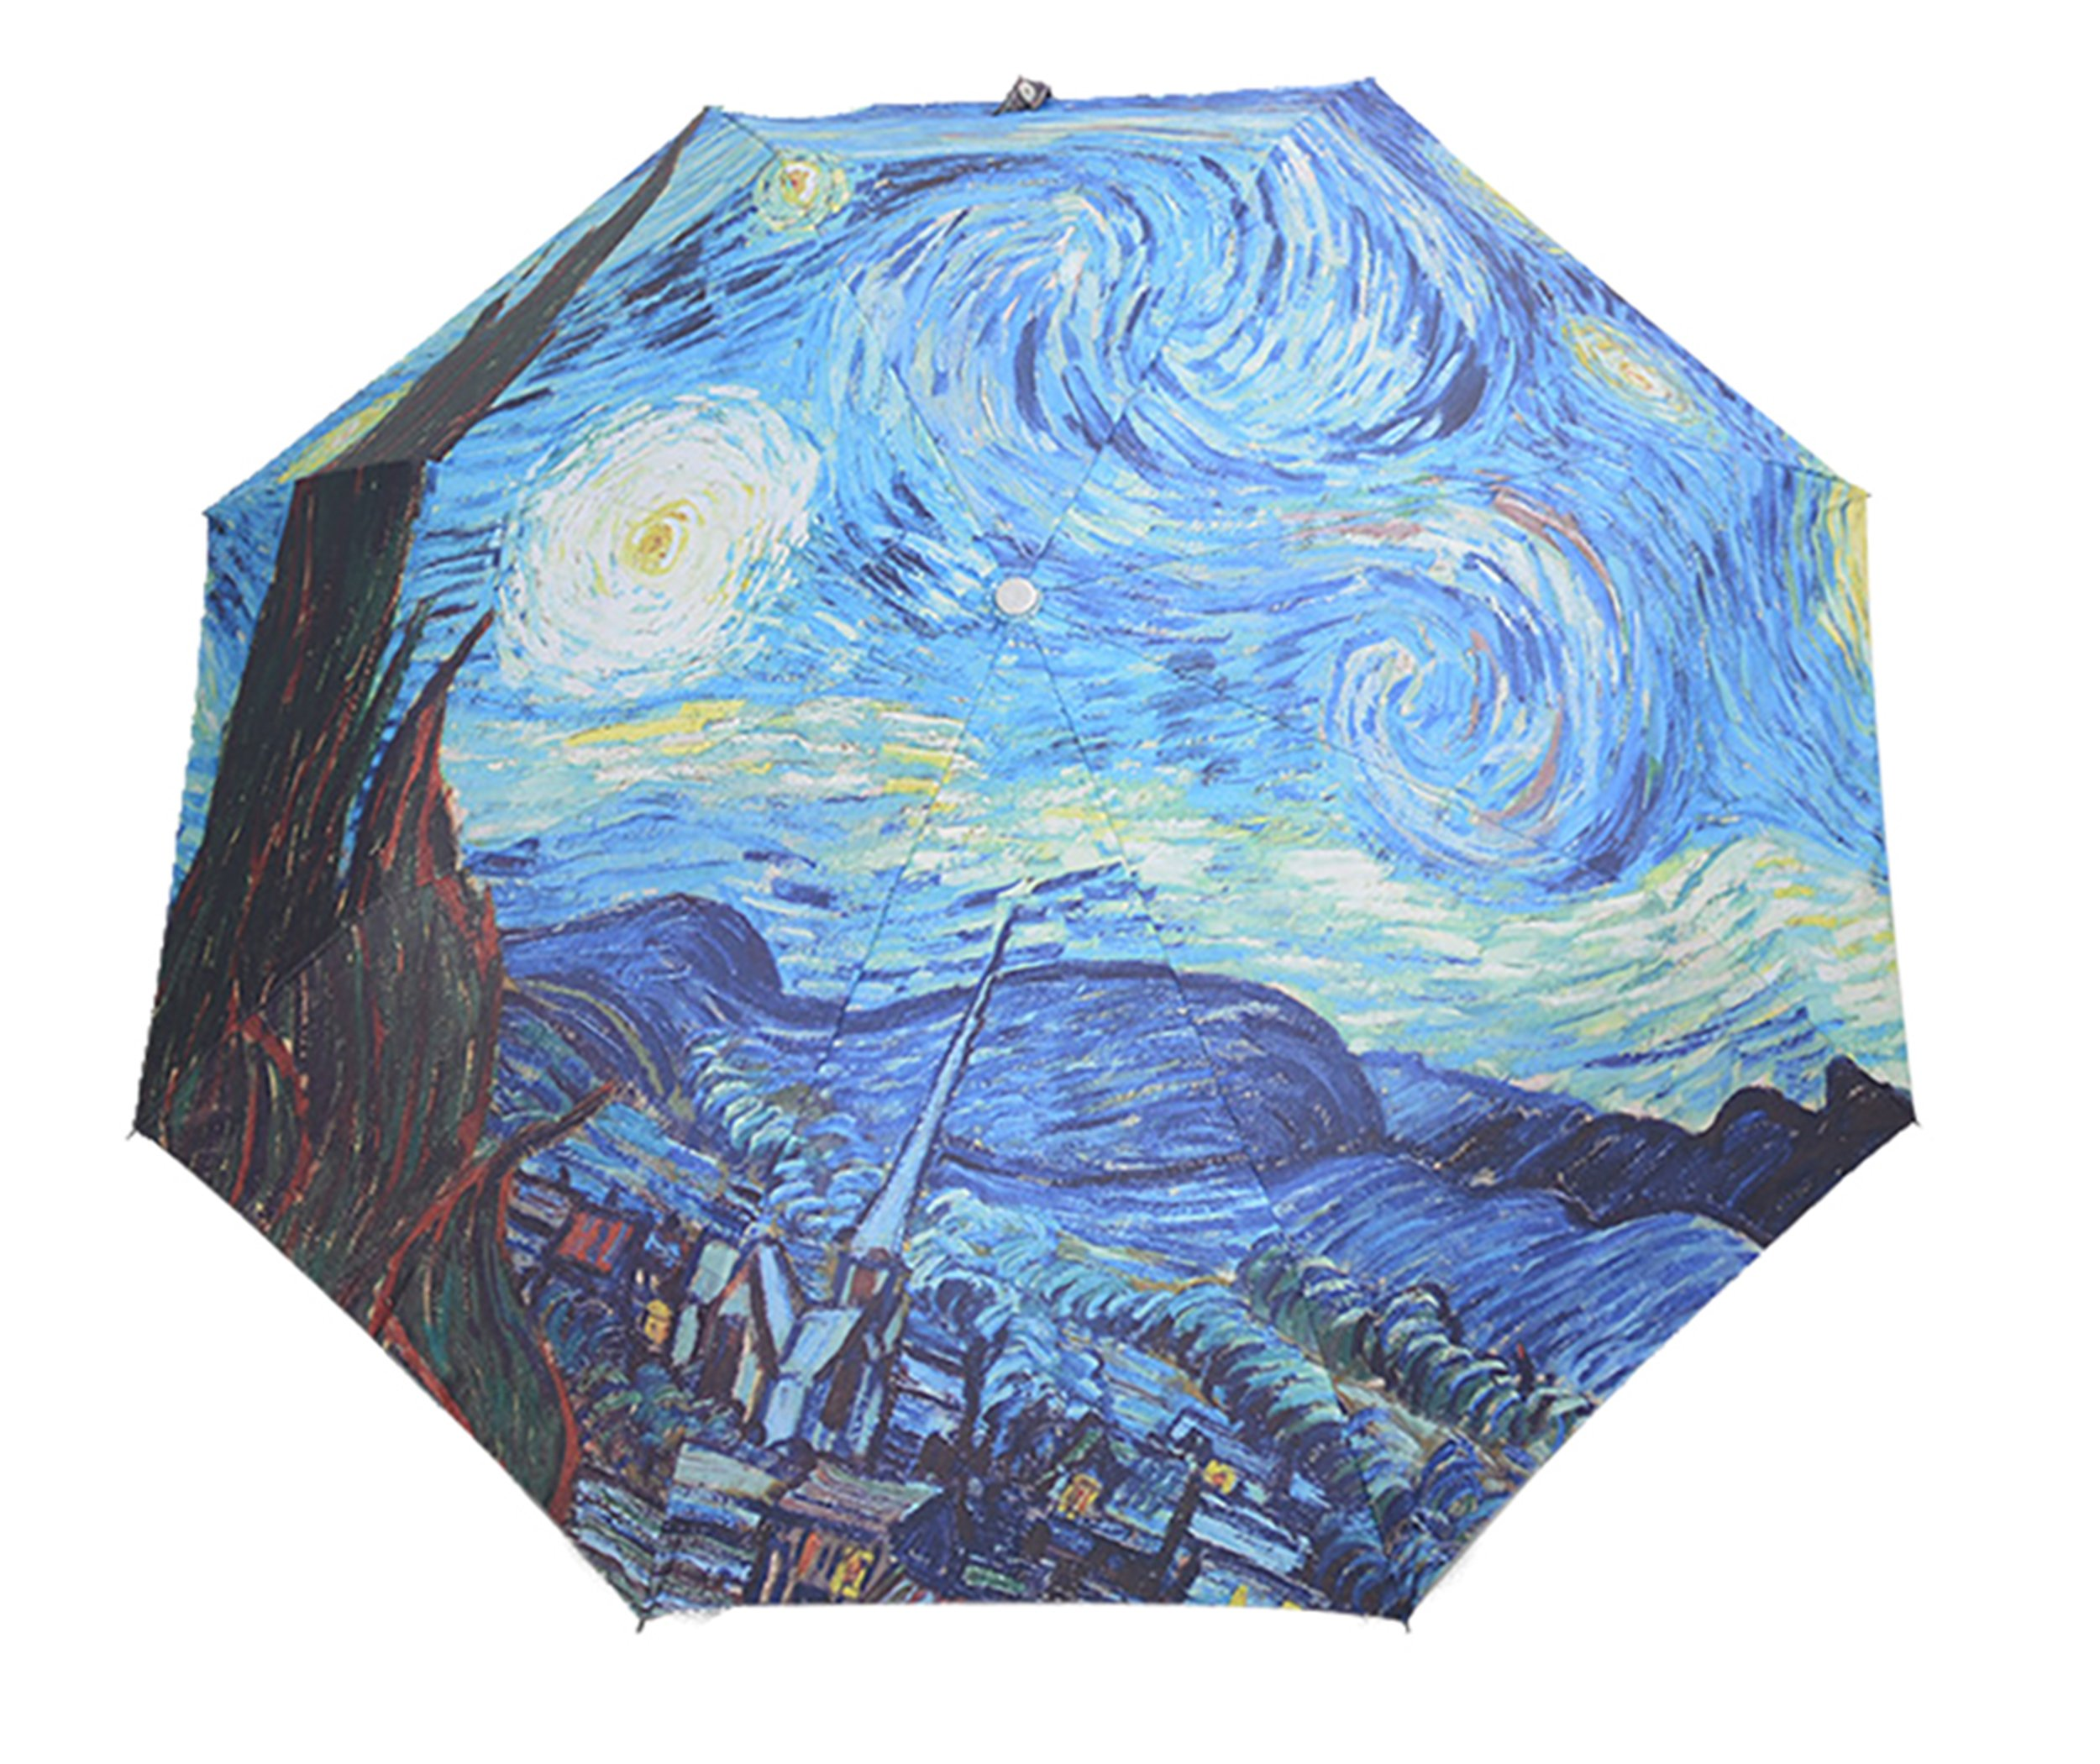 HappyGO Manual Open Compact Folding Travel Sunny Anti-UV Rainny Colorful Oil Painting Umbrella (Starry sky,8Ribs)